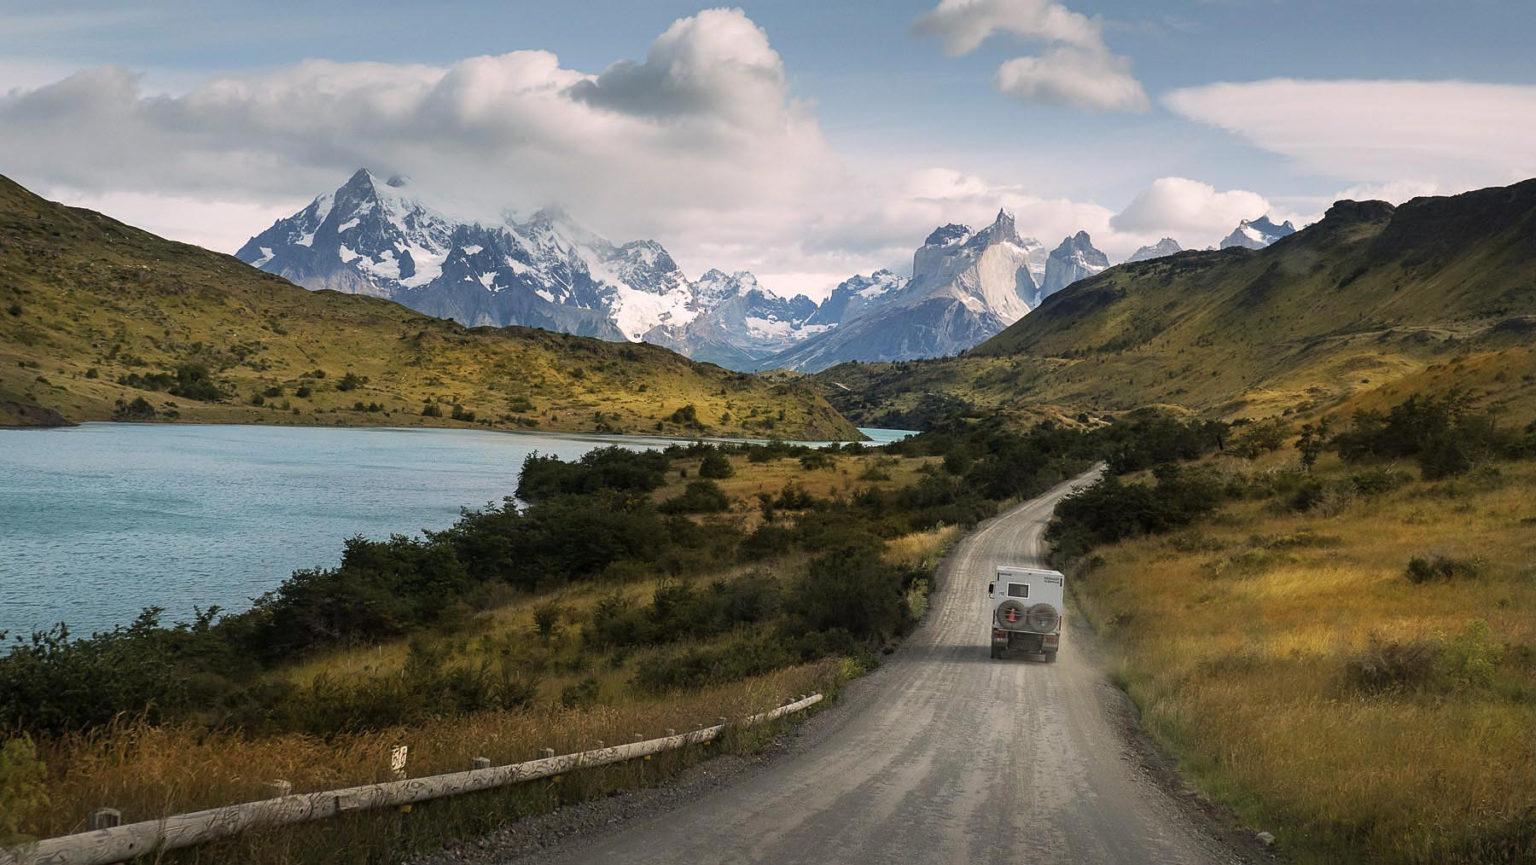 Anfahrt zum Torres del Paine Massiv